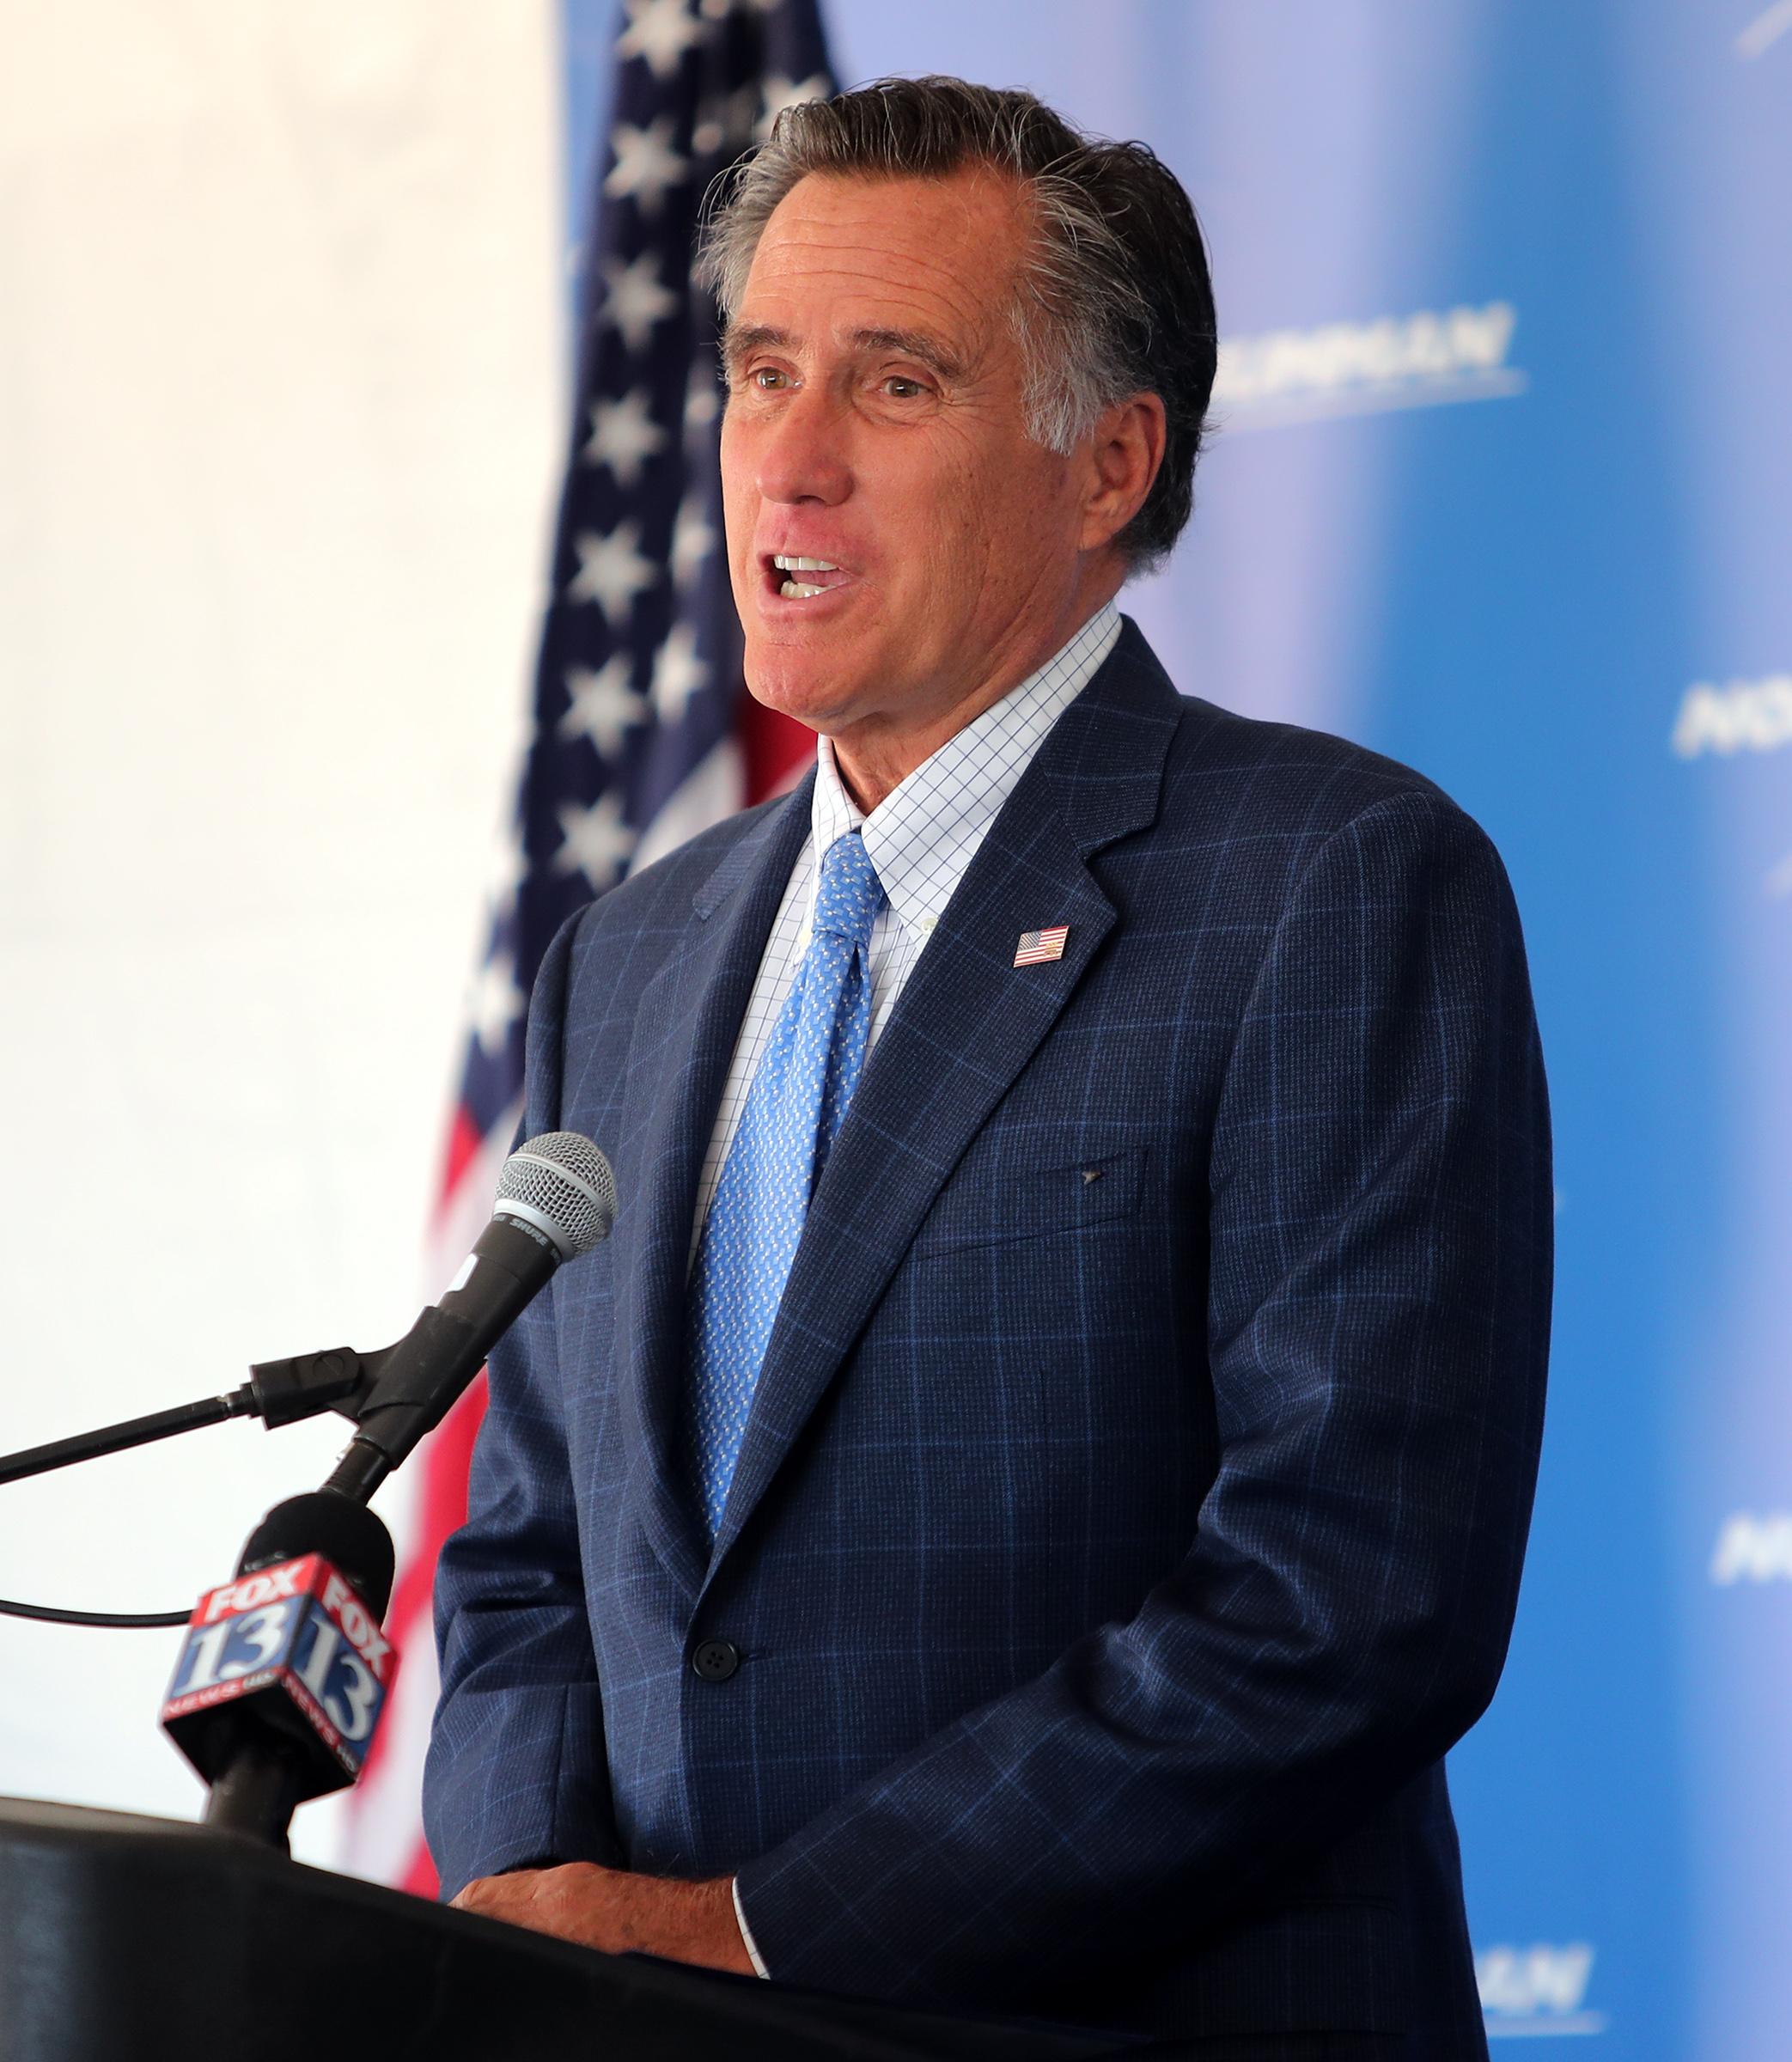 Sen. Mitt Romney, R-Utah, speaks during a groundbreaking ceremony for Northrop Grumman's missile defense development facility in Roy on Tuesday, Aug. 27, 2019.